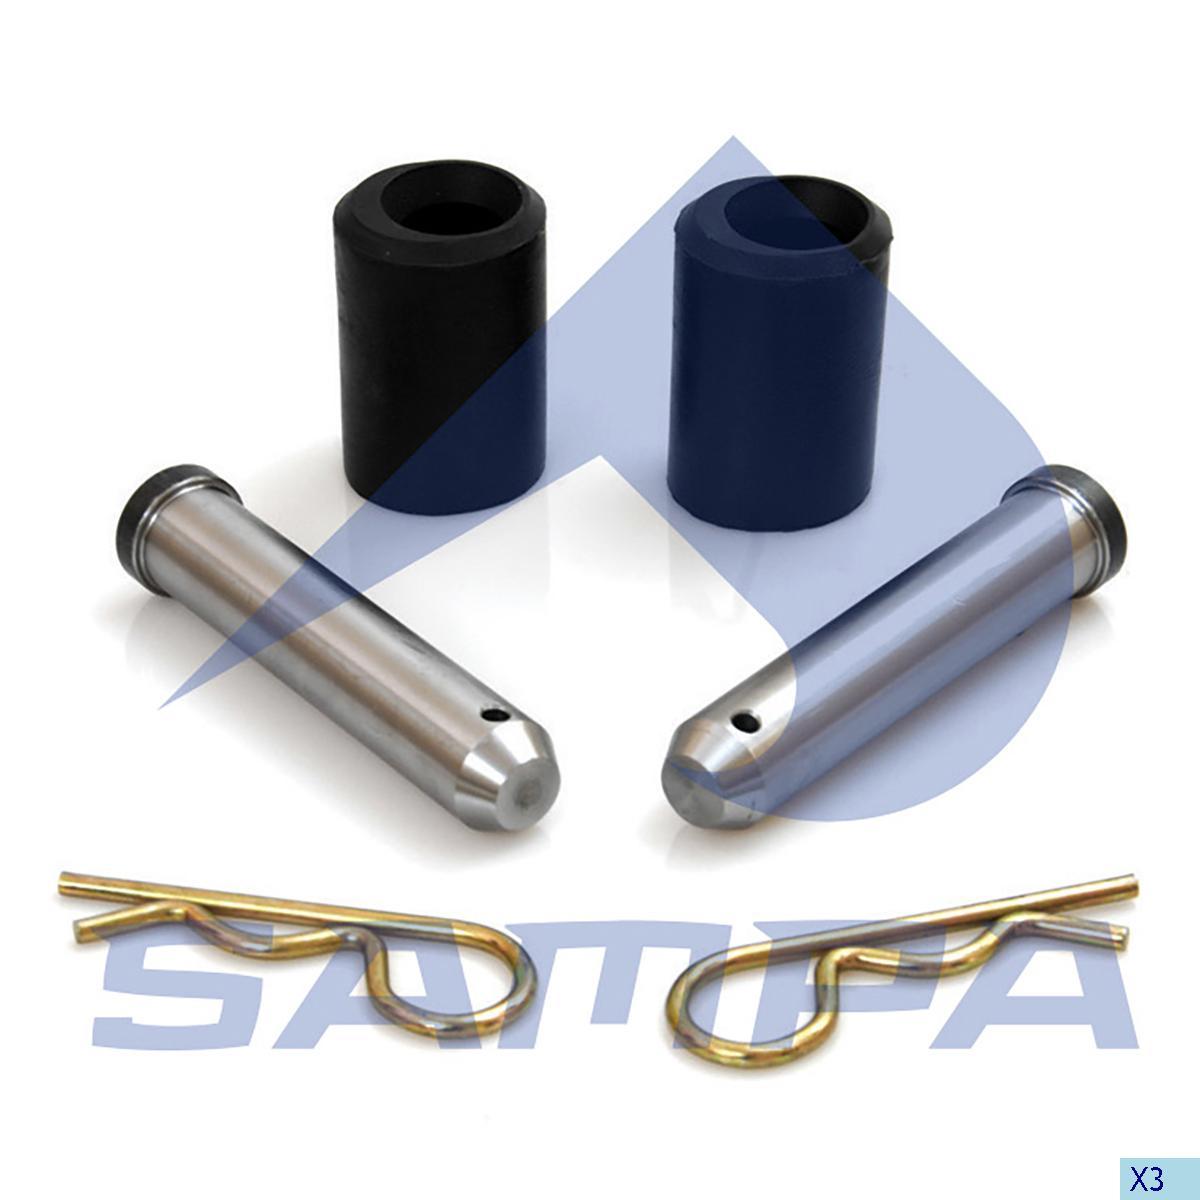 Repair Kit, Fifth Wheel, Fruehauf, Complementary Equipment